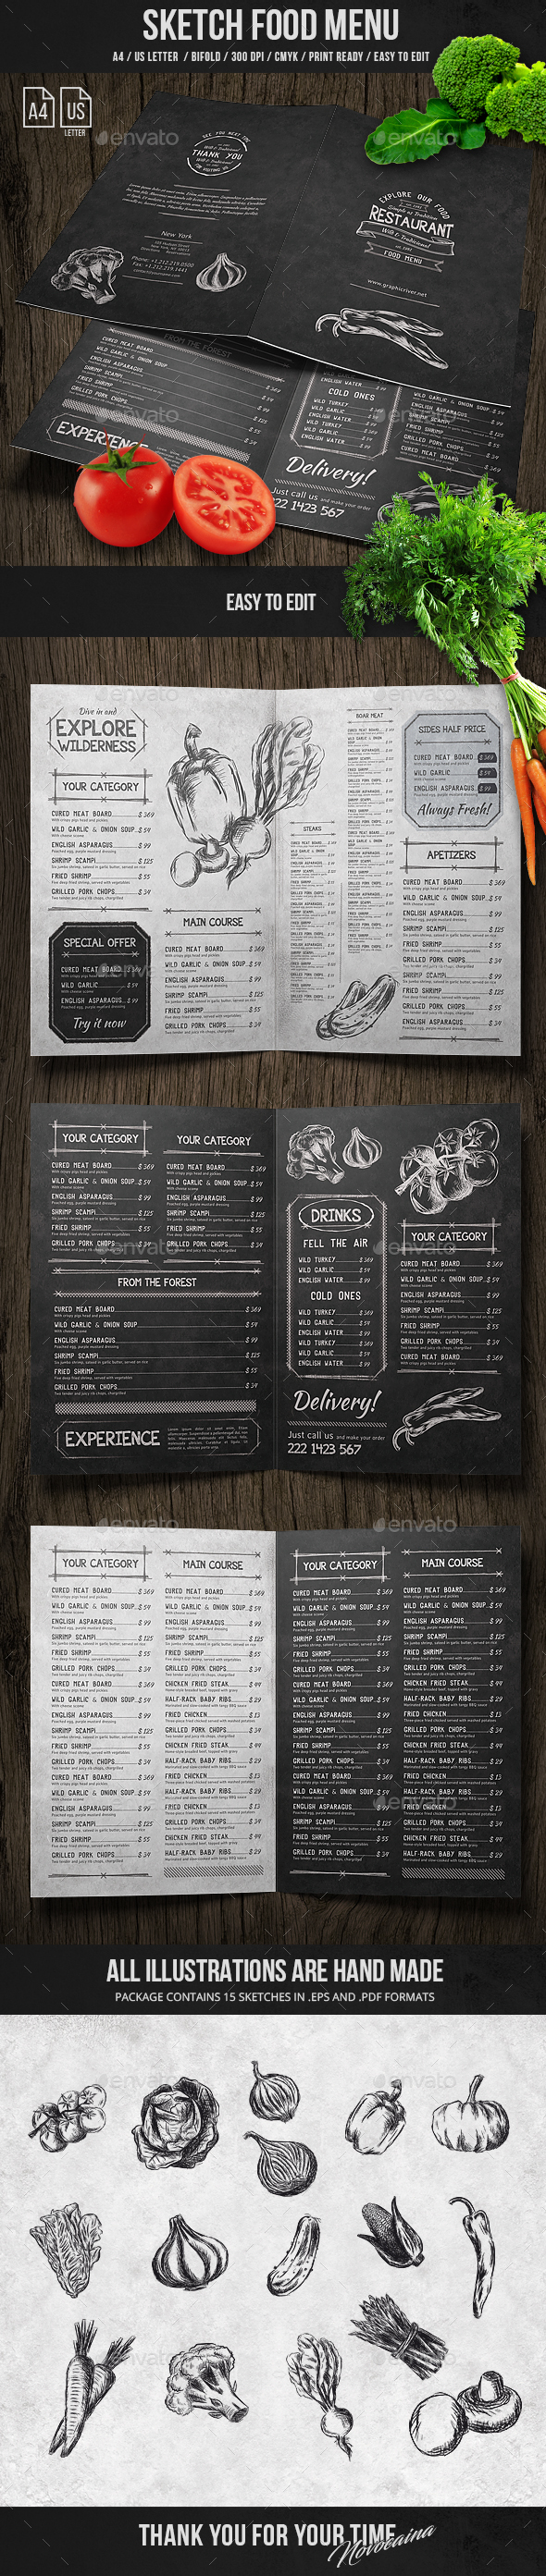 Sketch Bifold Menu - A4 and US Letter - Food Menus Print Templates